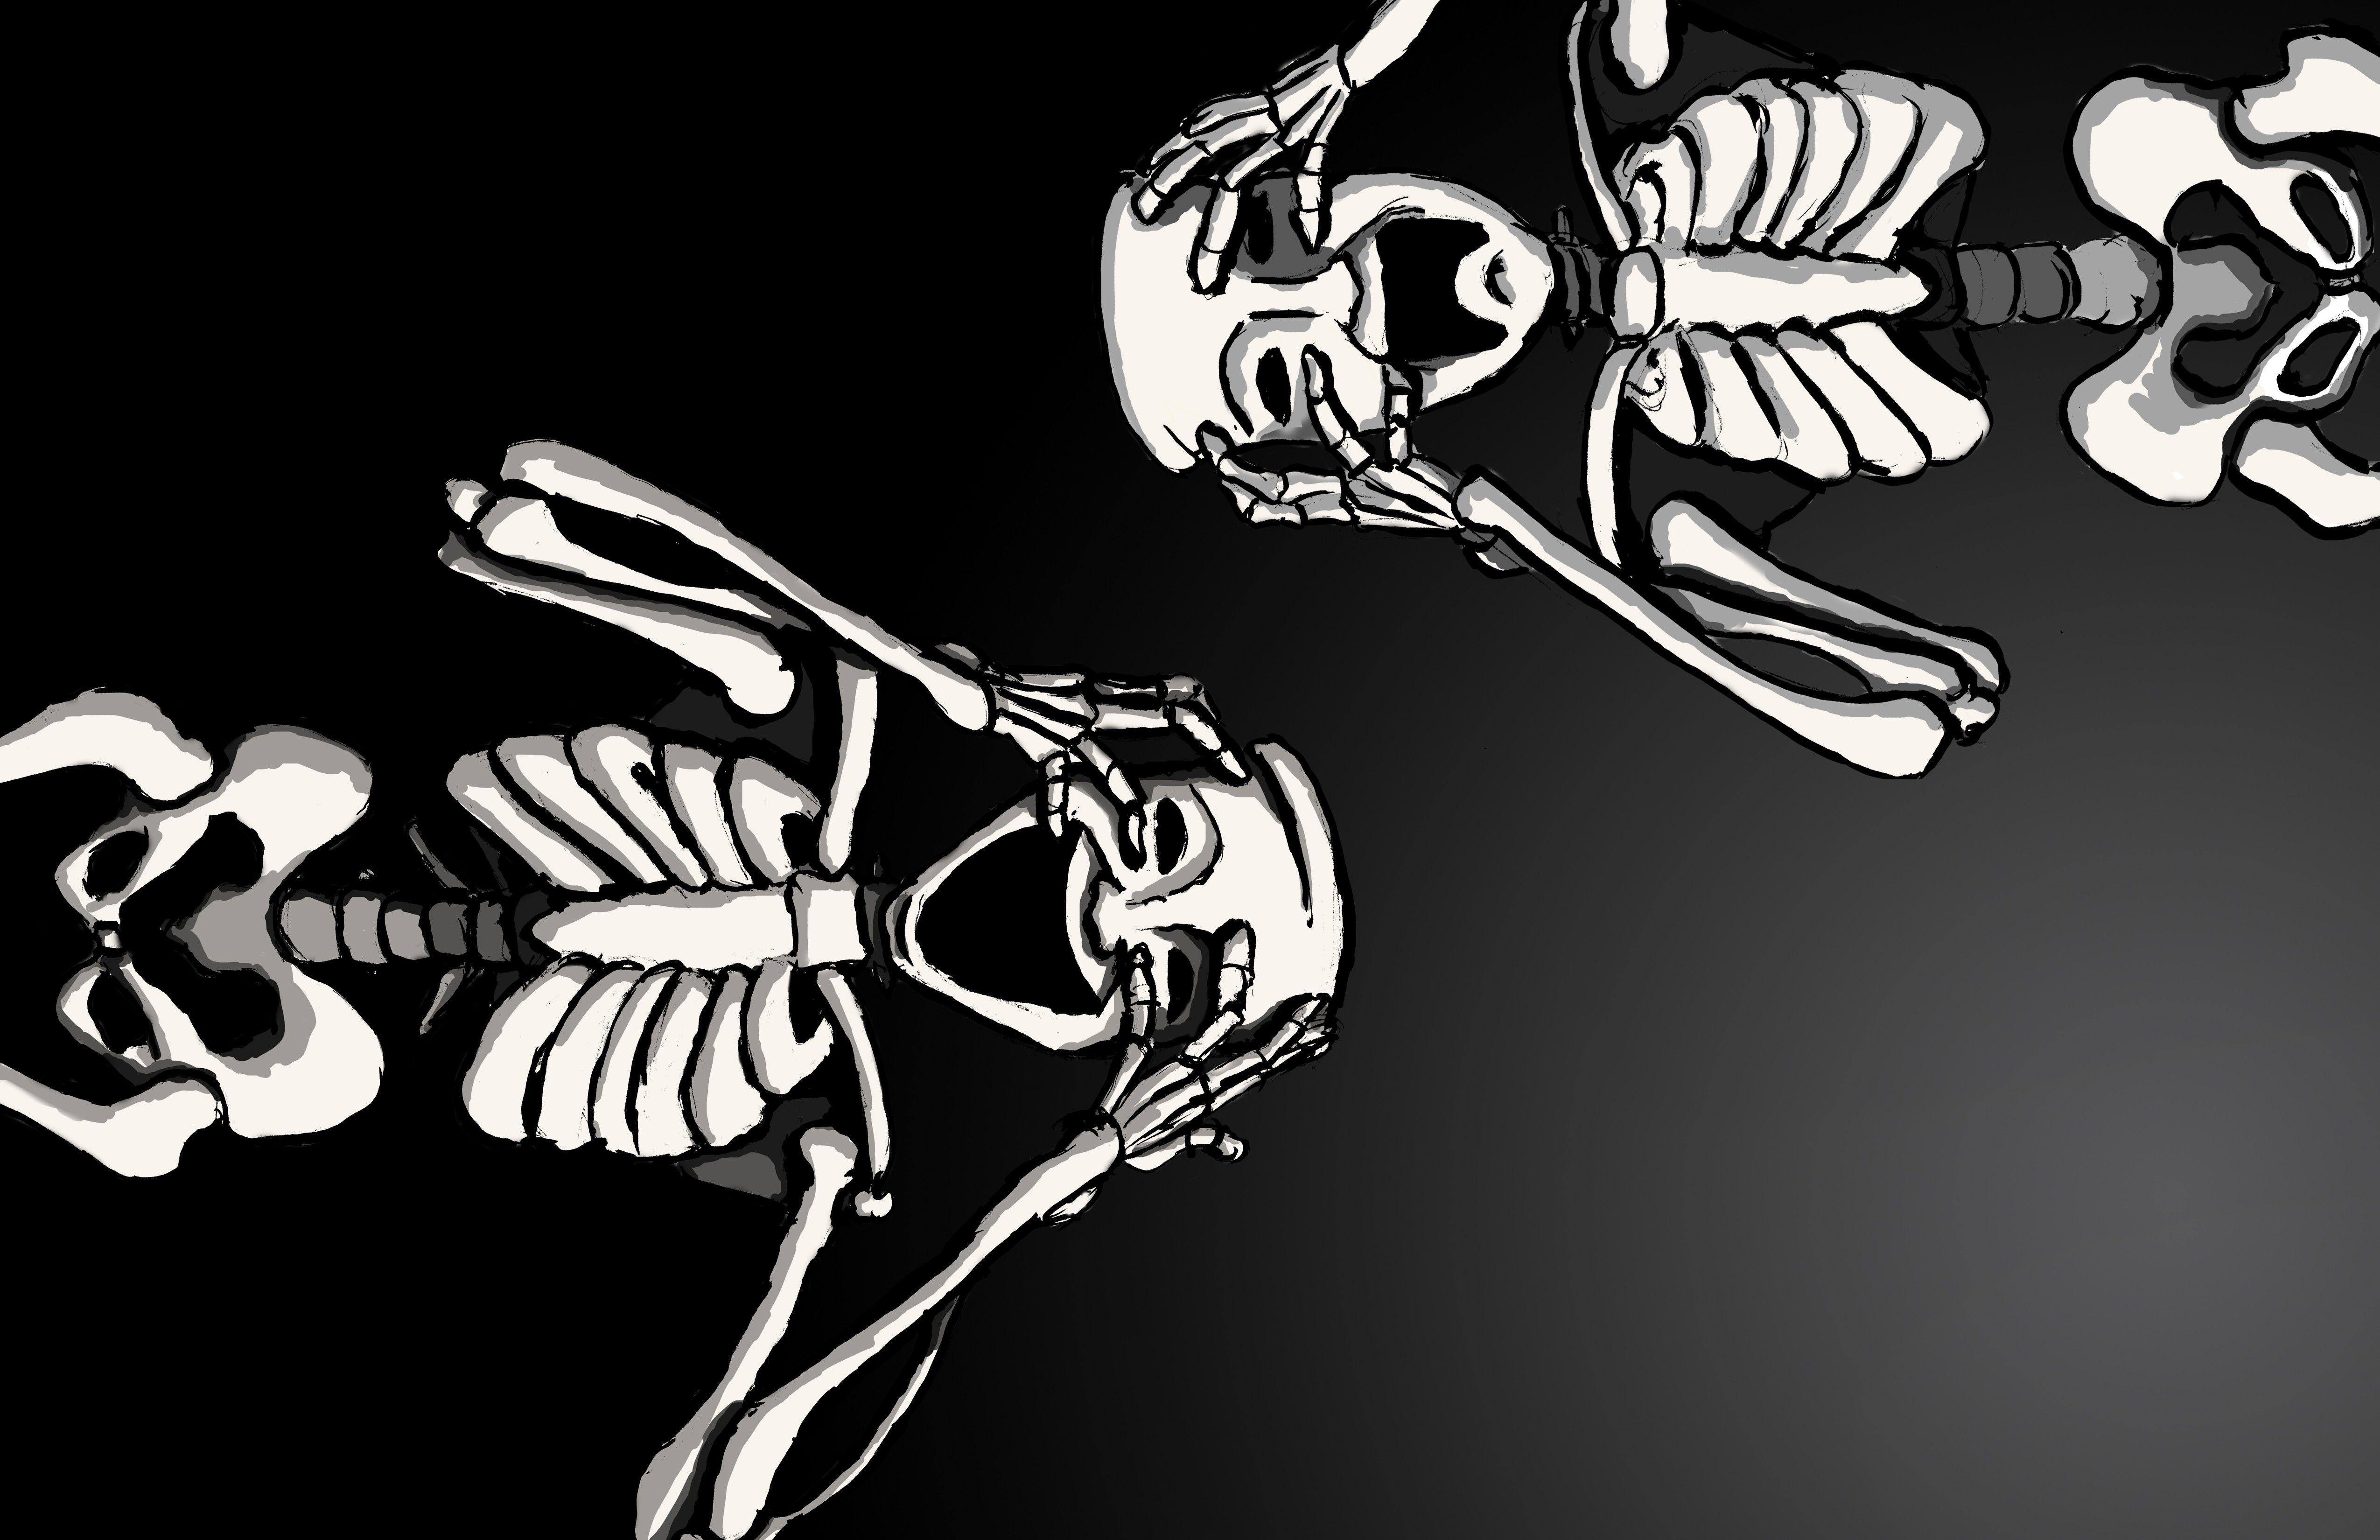 Halloween Skeleton Wallpaper.Free Download Halloween Skeleton Wallpaper Halloween